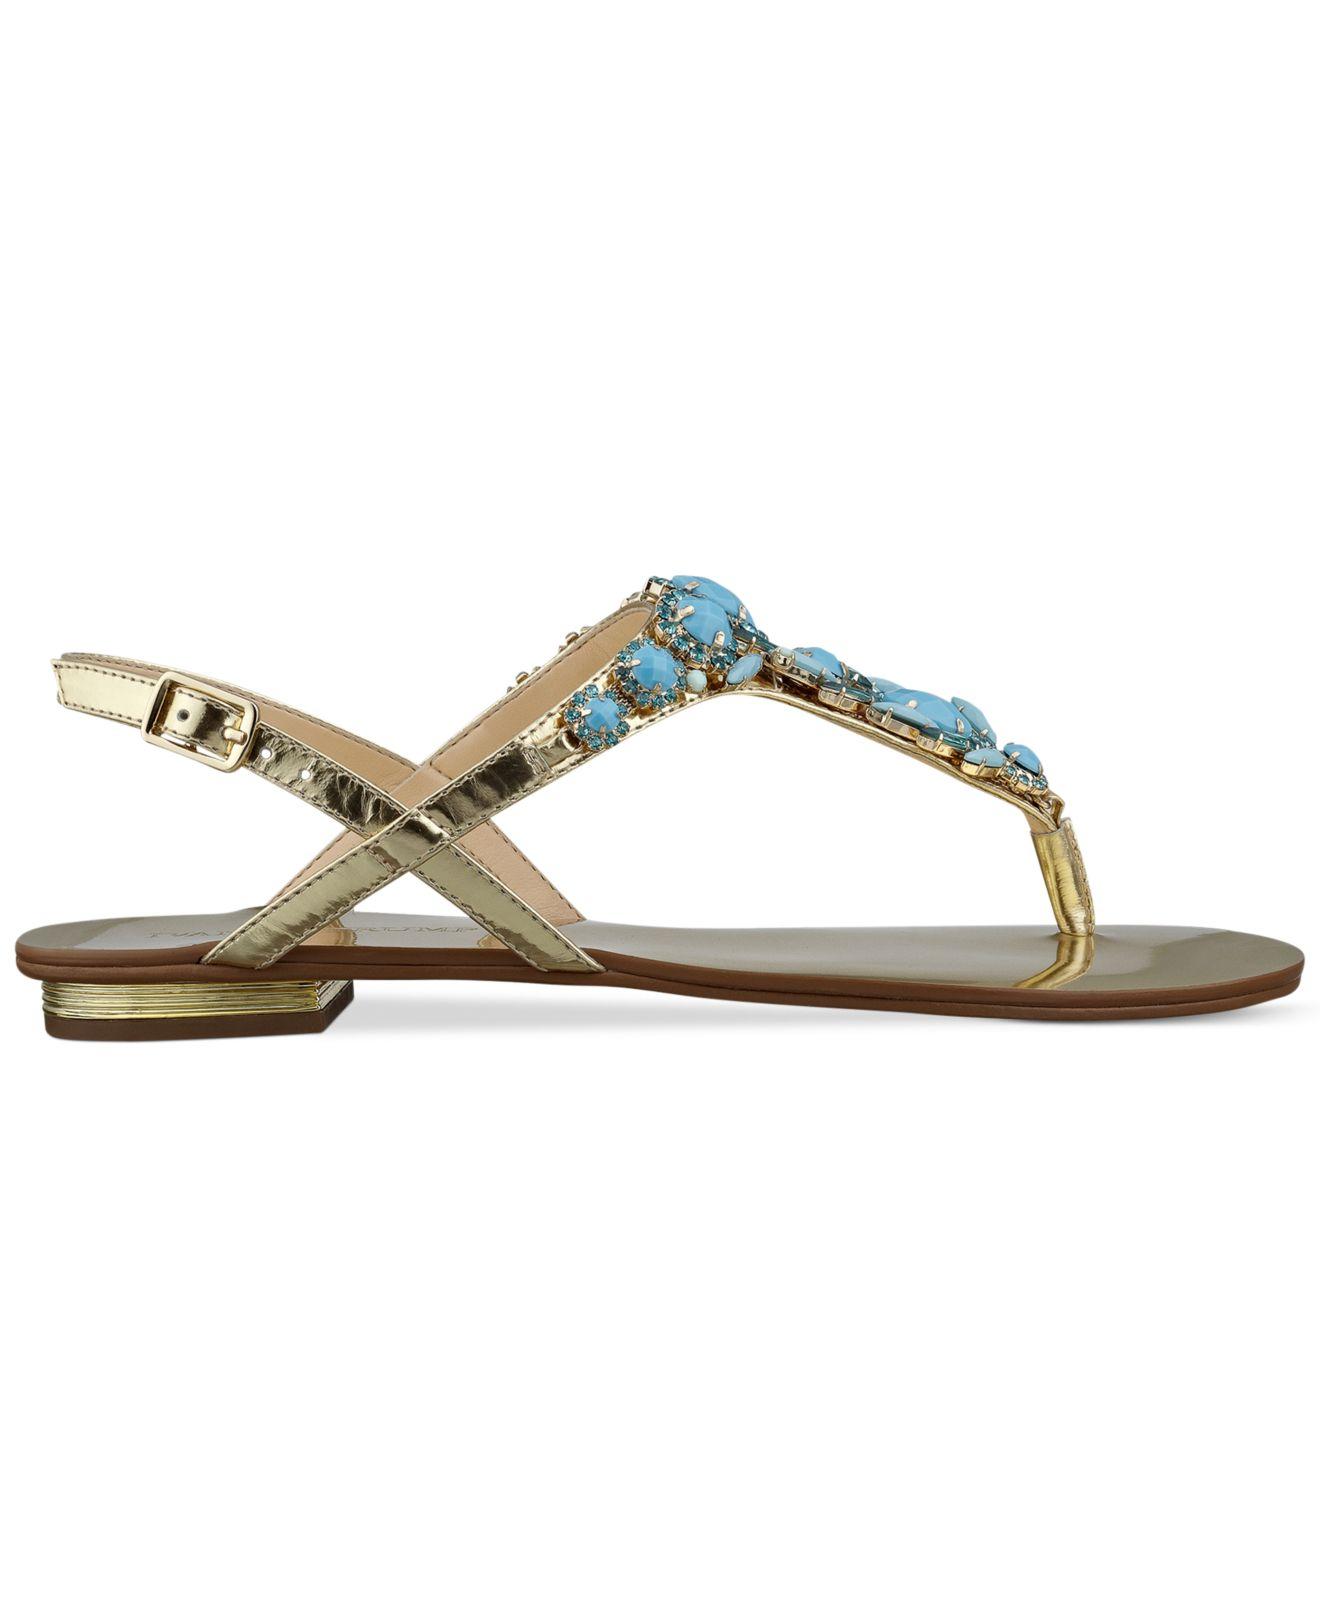 755bcb40e Lyst - Ivanka Trump Fona Jeweled Thong Sandals in Blue